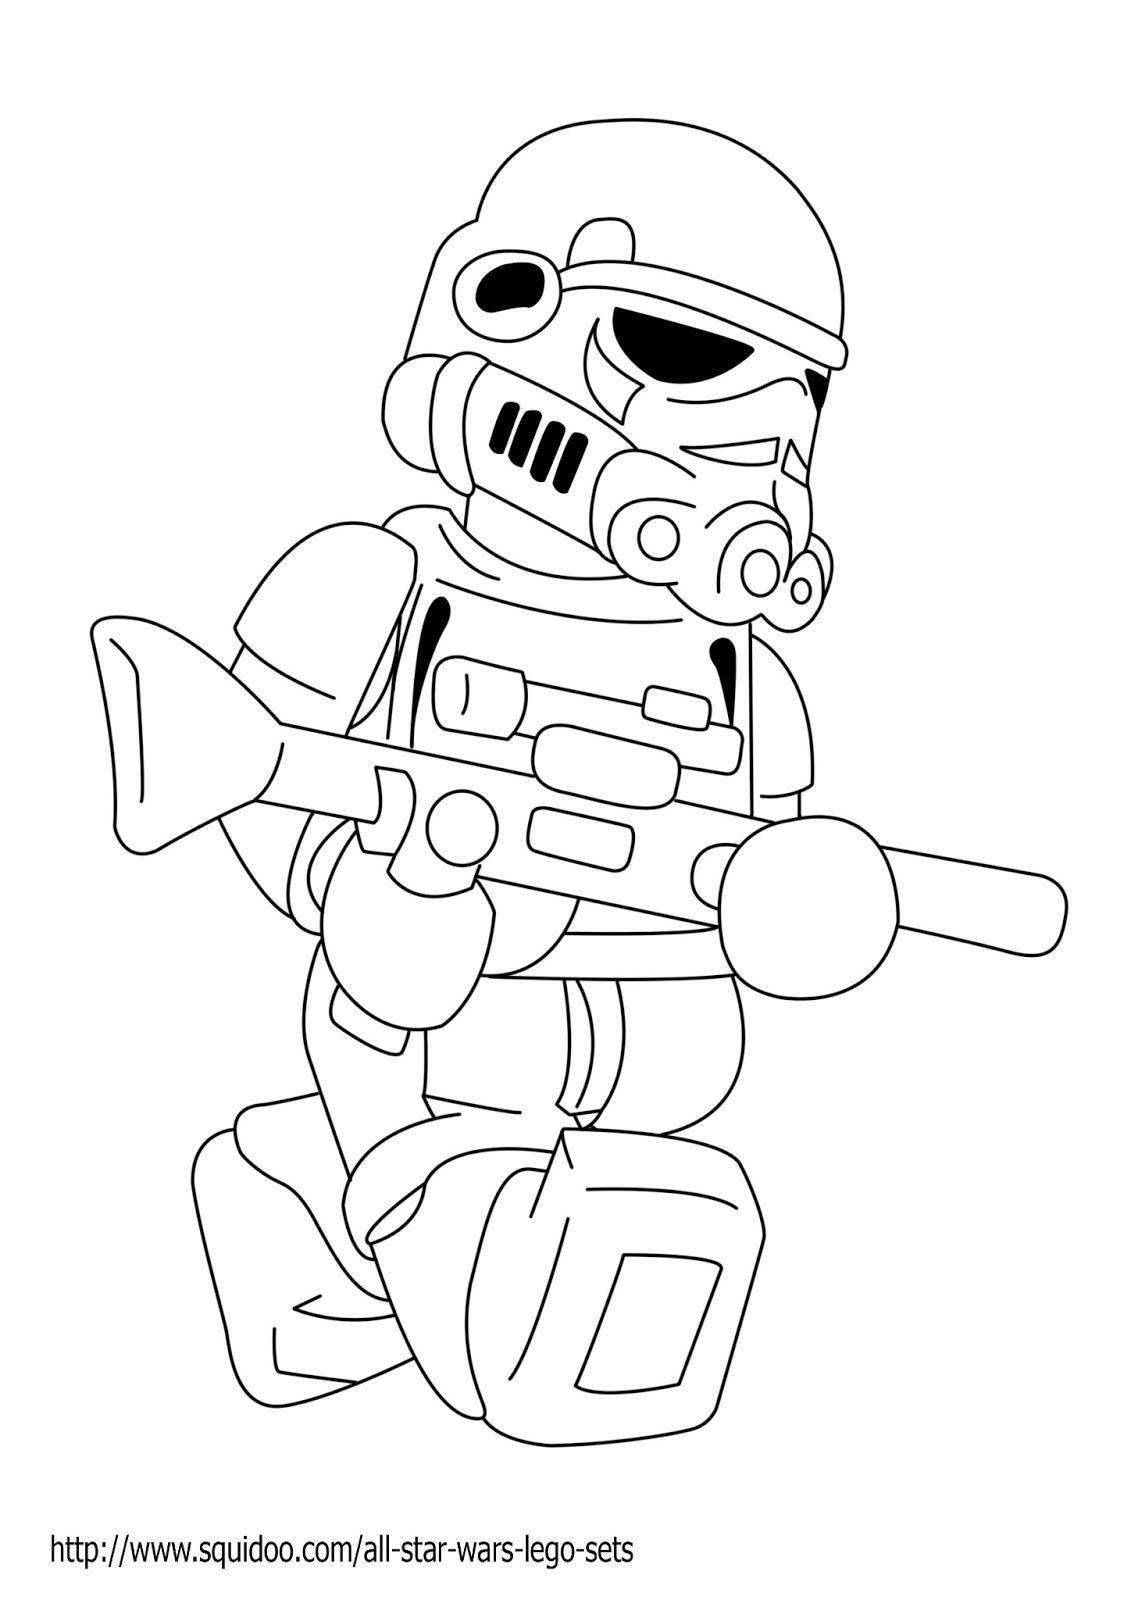 42 Coloriage Imprimer Star Wars Gratuit In 2020 Lego Coloring Pages Turtle Coloring Pages Star Wars Coloring Sheet